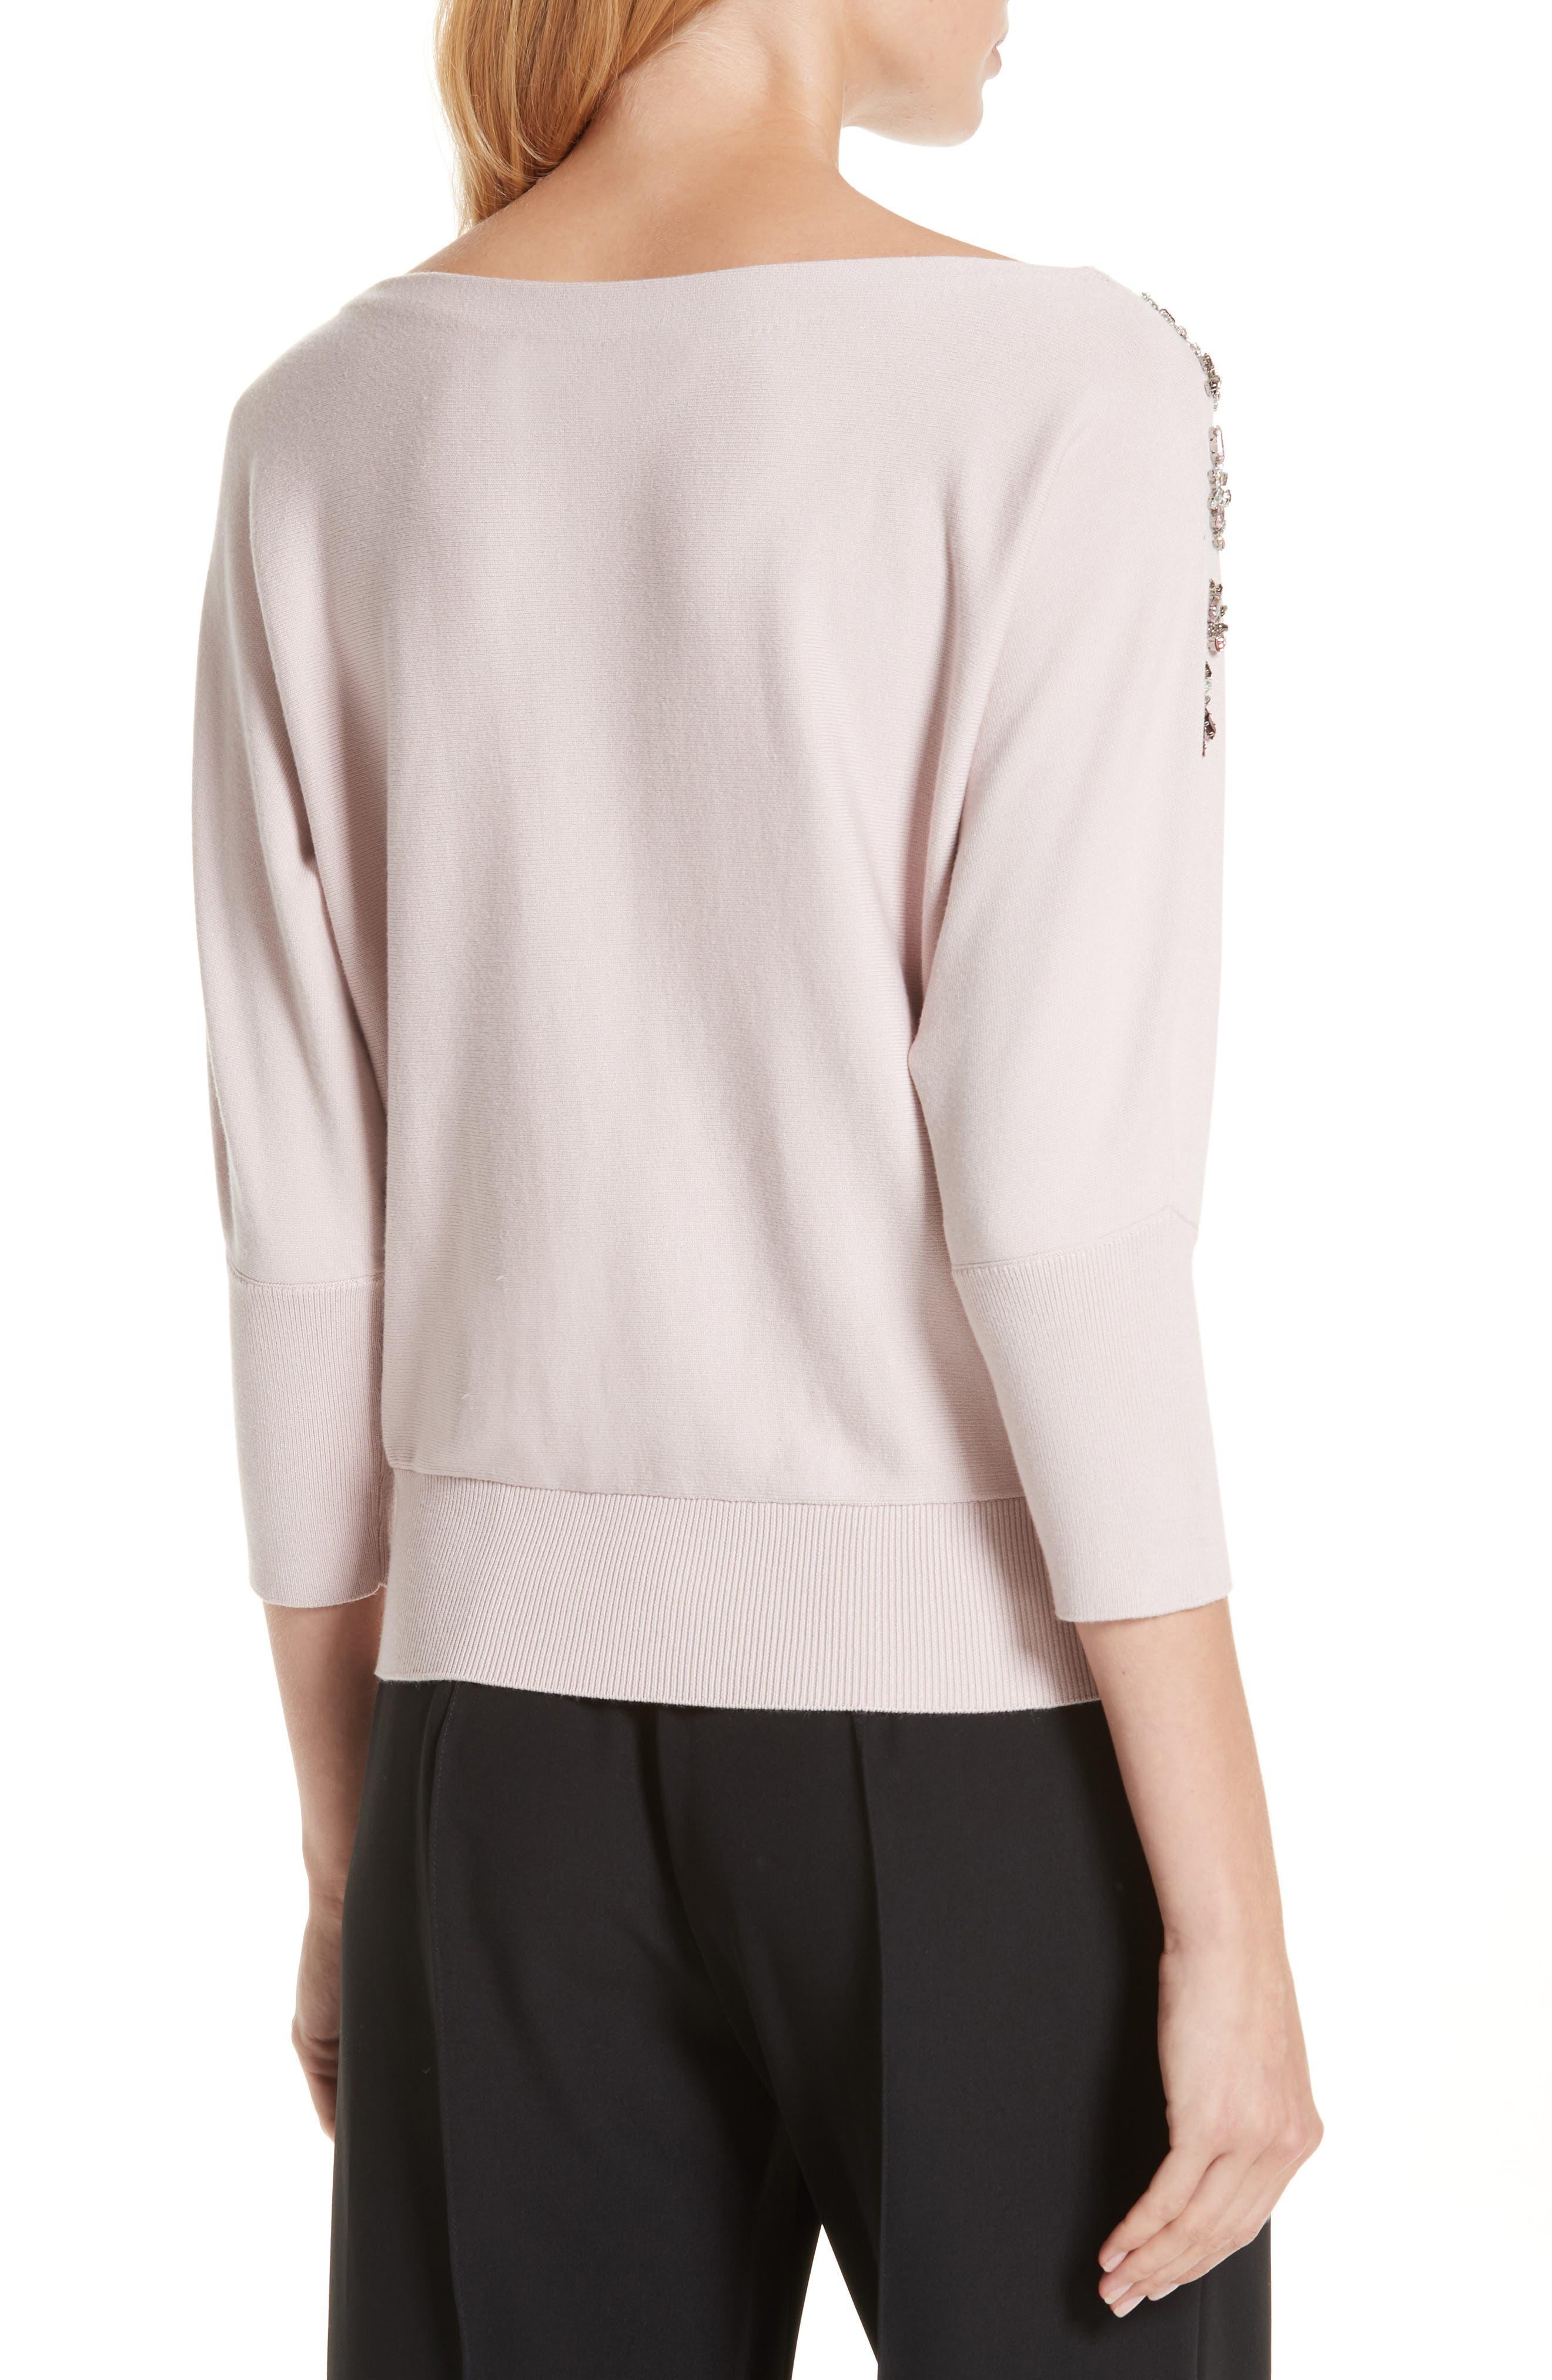 MILLY,                             Faux Gem Embellished Sweater,                             Alternate thumbnail 2, color,                             BALLET